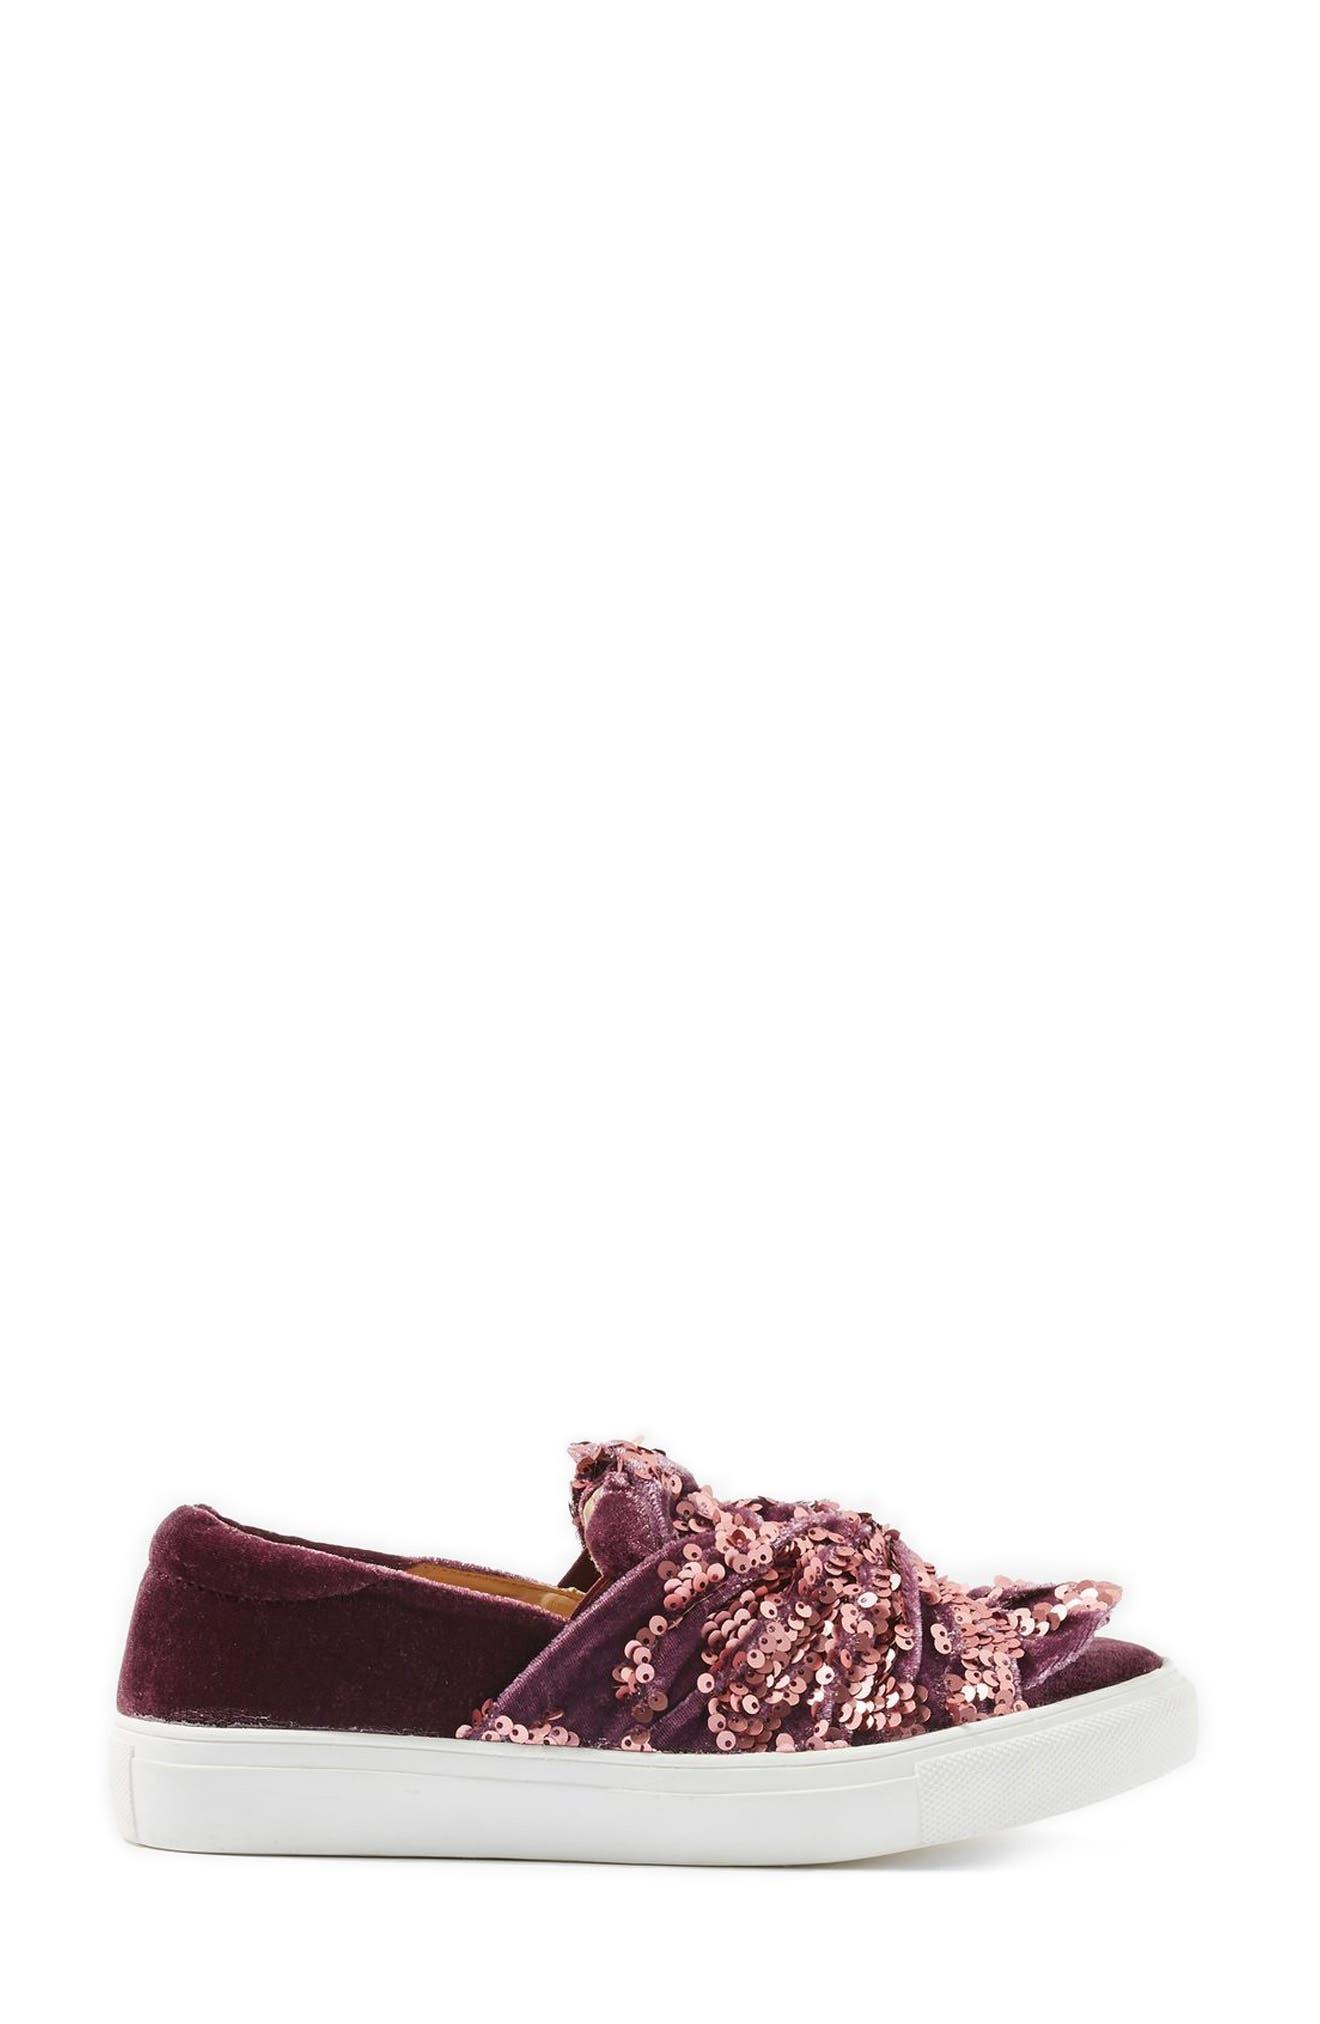 Twisted Sequin Velvet Sneakers,                             Alternate thumbnail 2, color,                             Pink